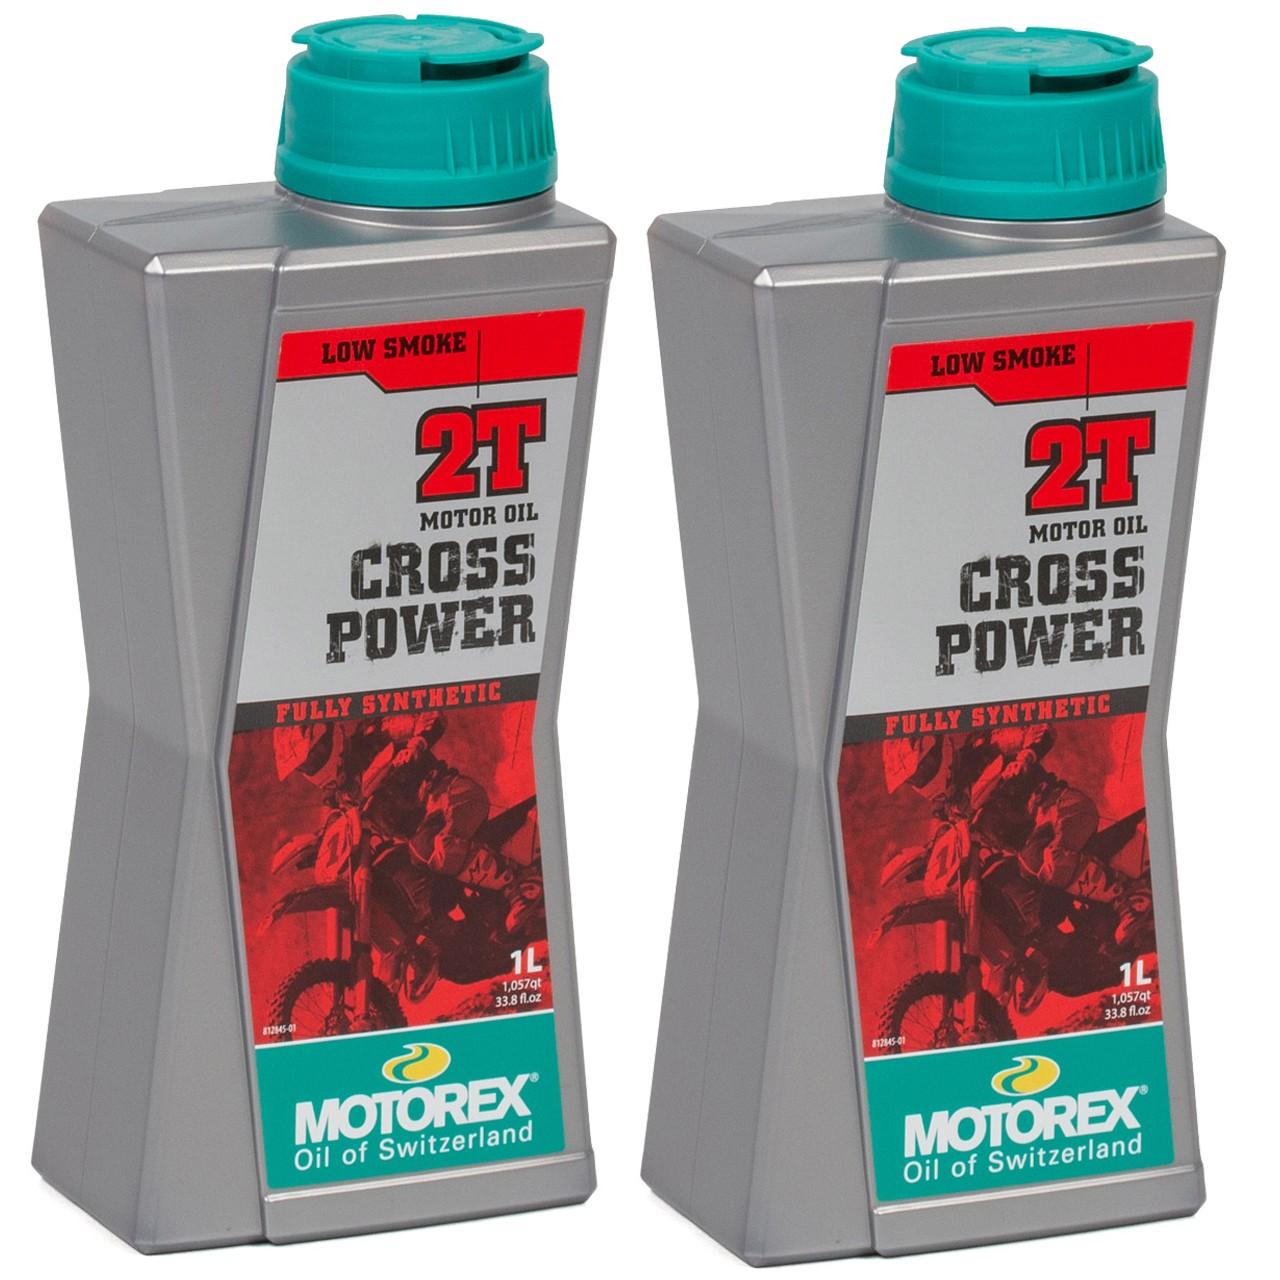 MOTOREX Cross Power 2T LOW SMOKE Motoröl API TC JASO FD ISO-L-EGD - 2L 2 Liter